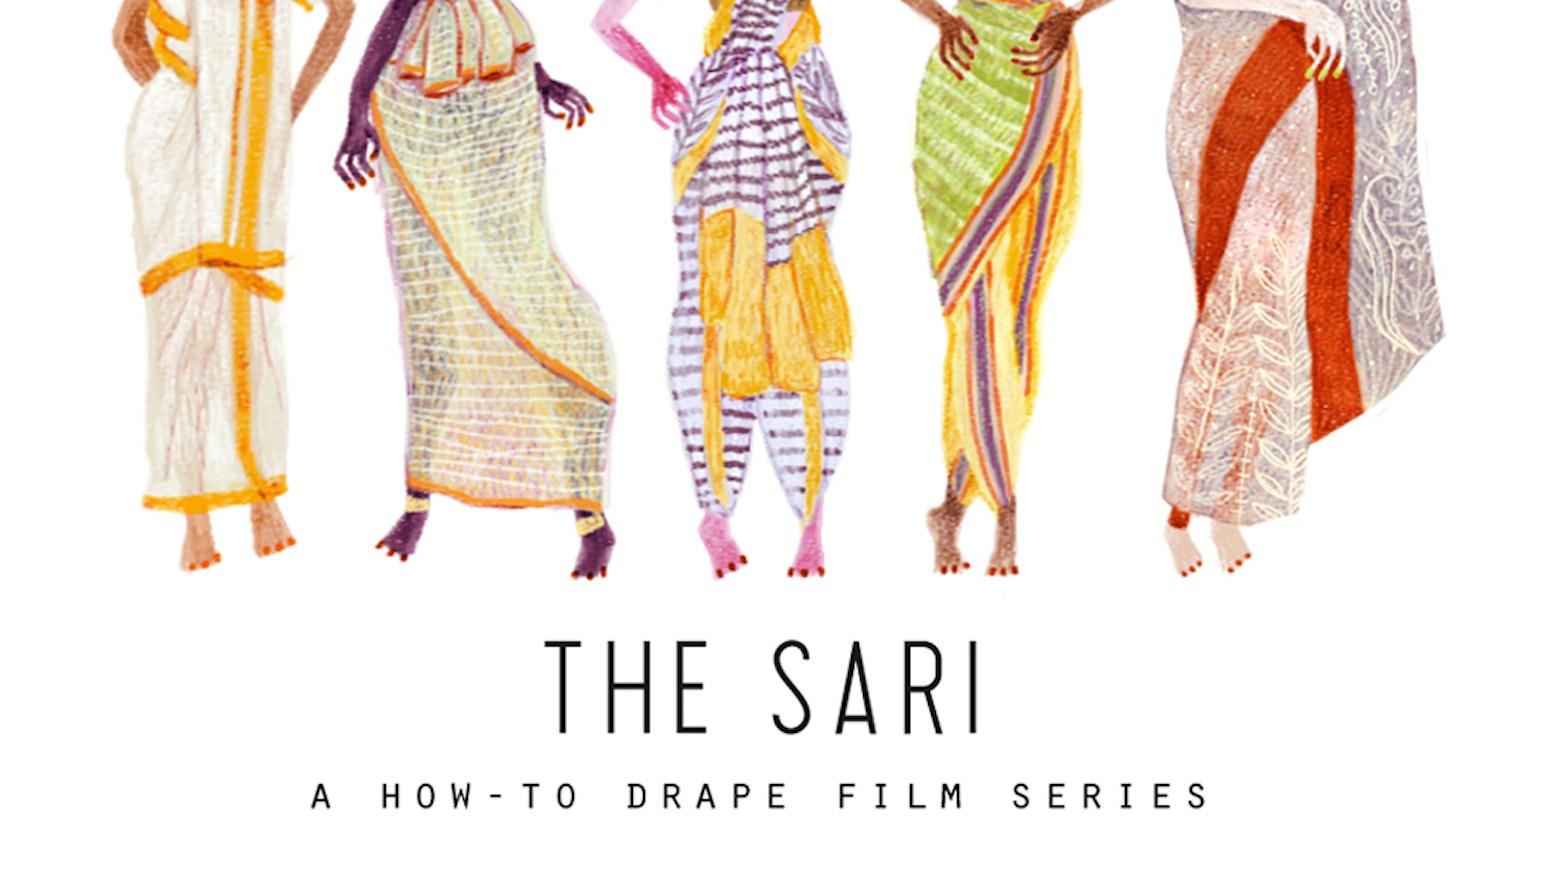 The Sari  A How-To Drape Film Series by Border Fall — Kickstarter bc1c29fb9